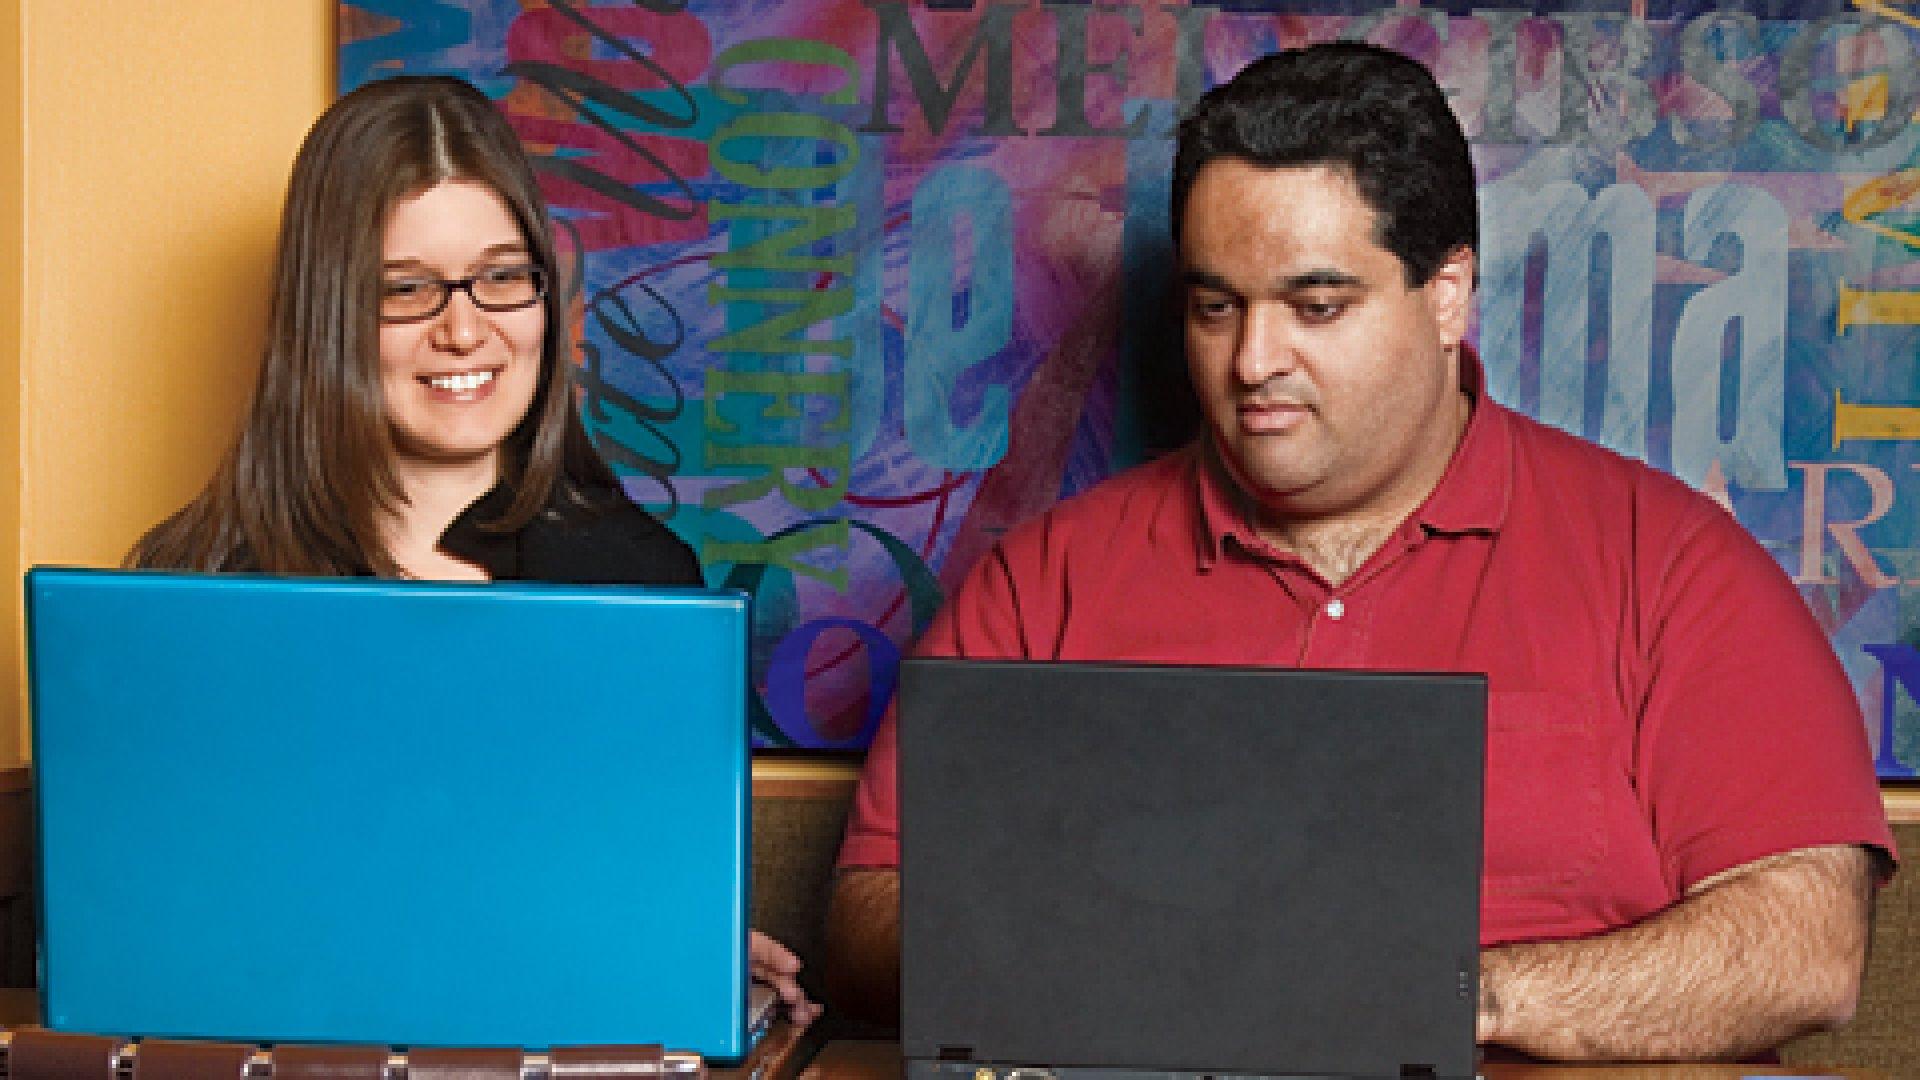 Low Overhead: Lifesta's co-founders, Yael Gavish and Eran Davidov, run their company out of a café in New York City.